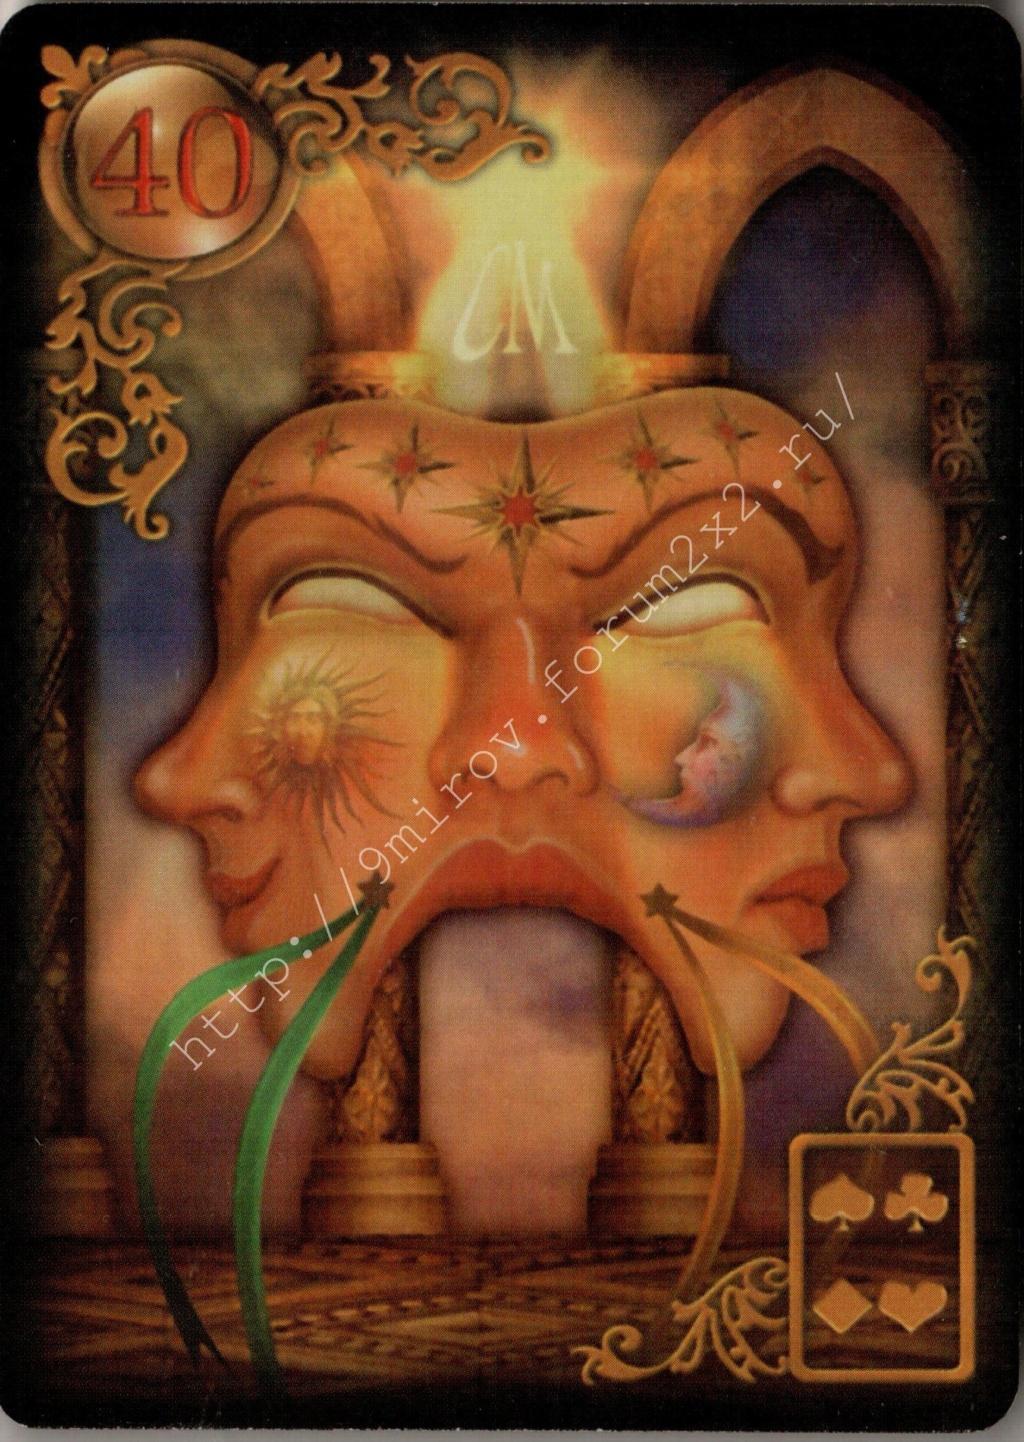 Золотые мечты Ленорман (Расширенное издание) | Gilded Reverie Lenormand. Галерея.  Water132